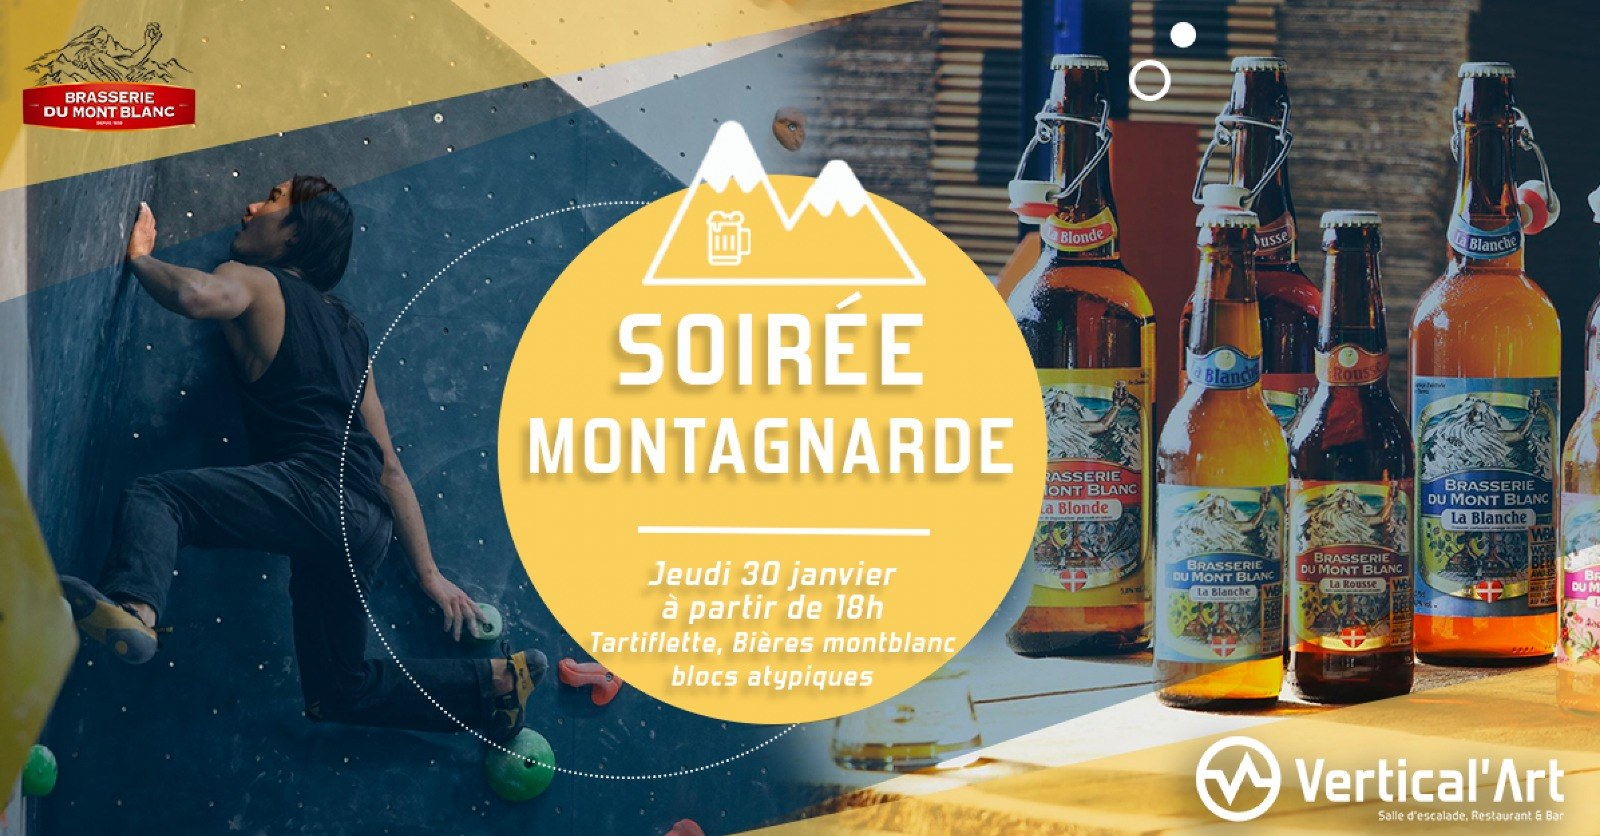 soirée montagnarde à Vertical'art Rungis - salle d'escalade de bloc restaurant et bar